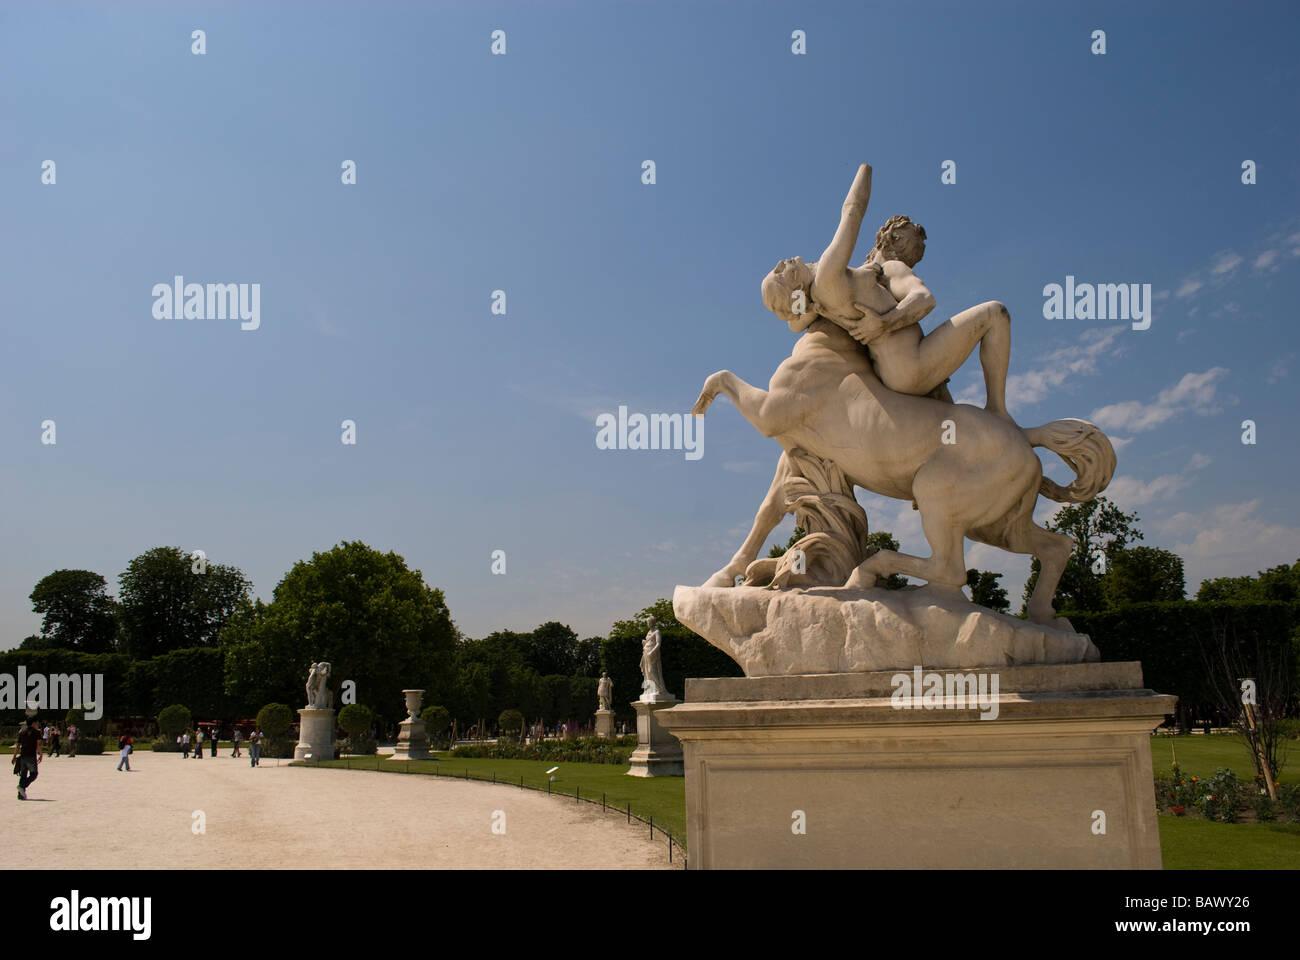 Tuileries garden statues stock photos tuileries garden statues stock images alamy - Statues jardin des tuileries ...